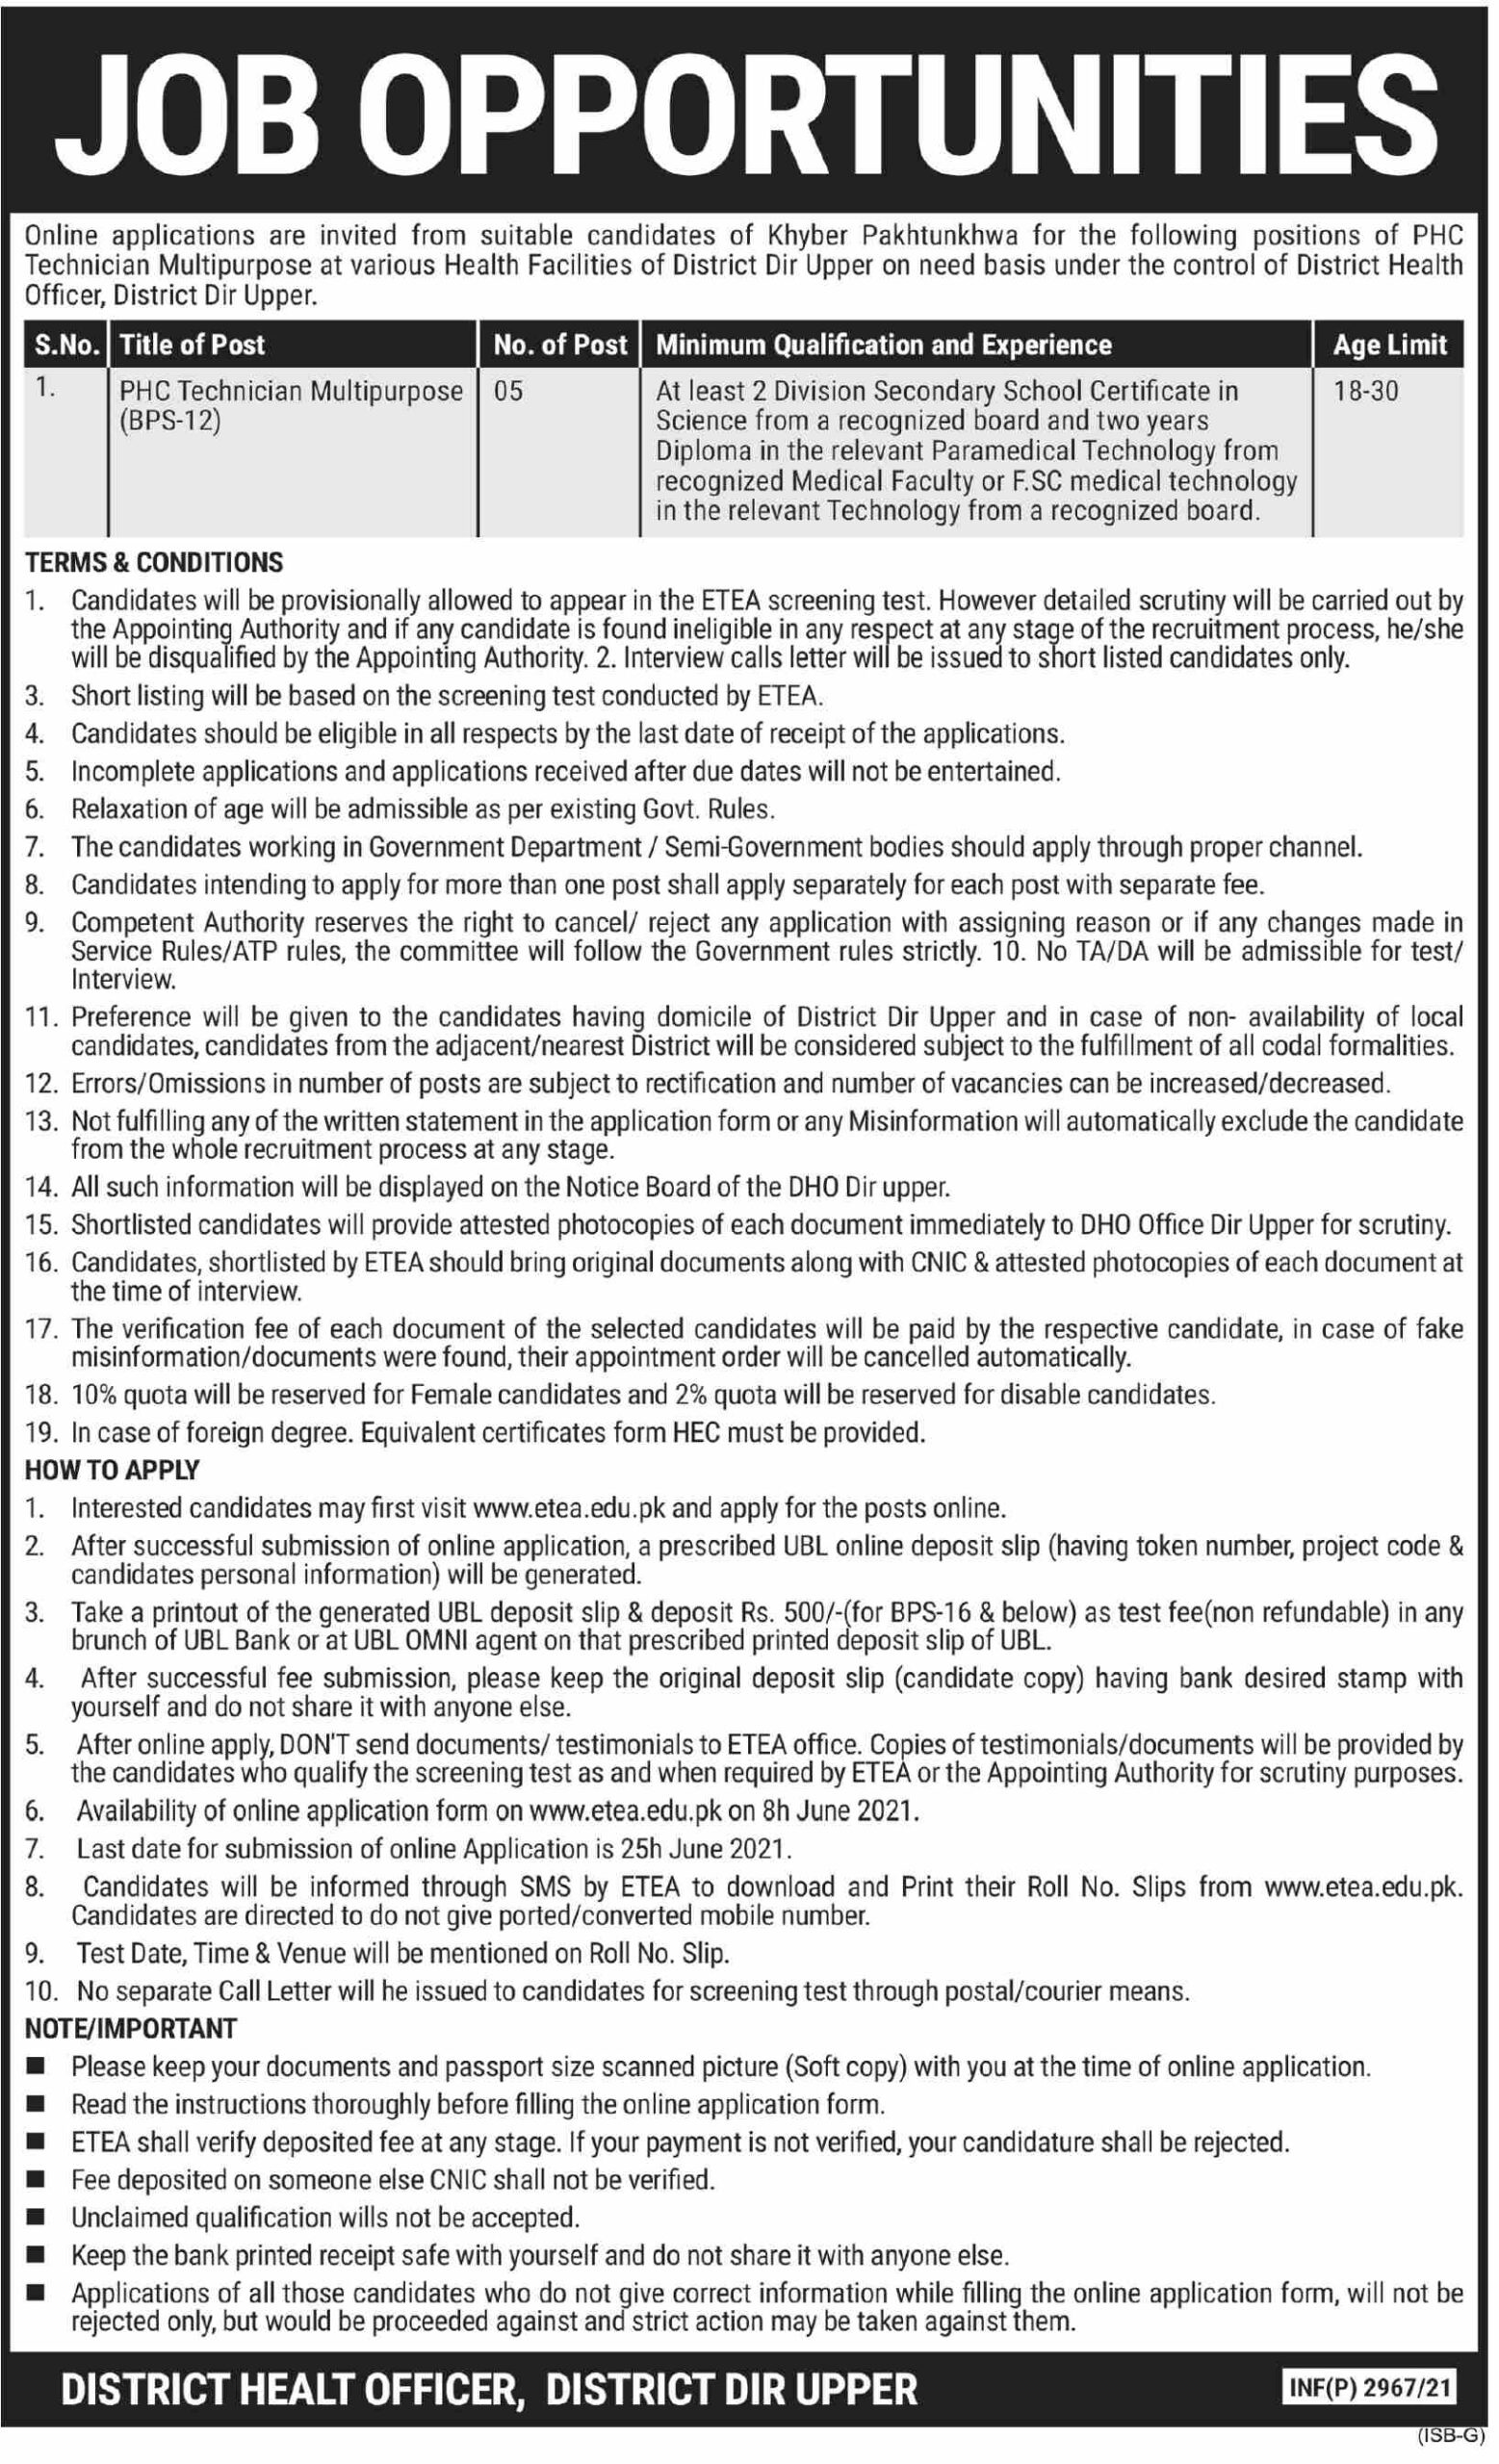 KPK Health Department District Dir Upper Latest Jobs June 2021